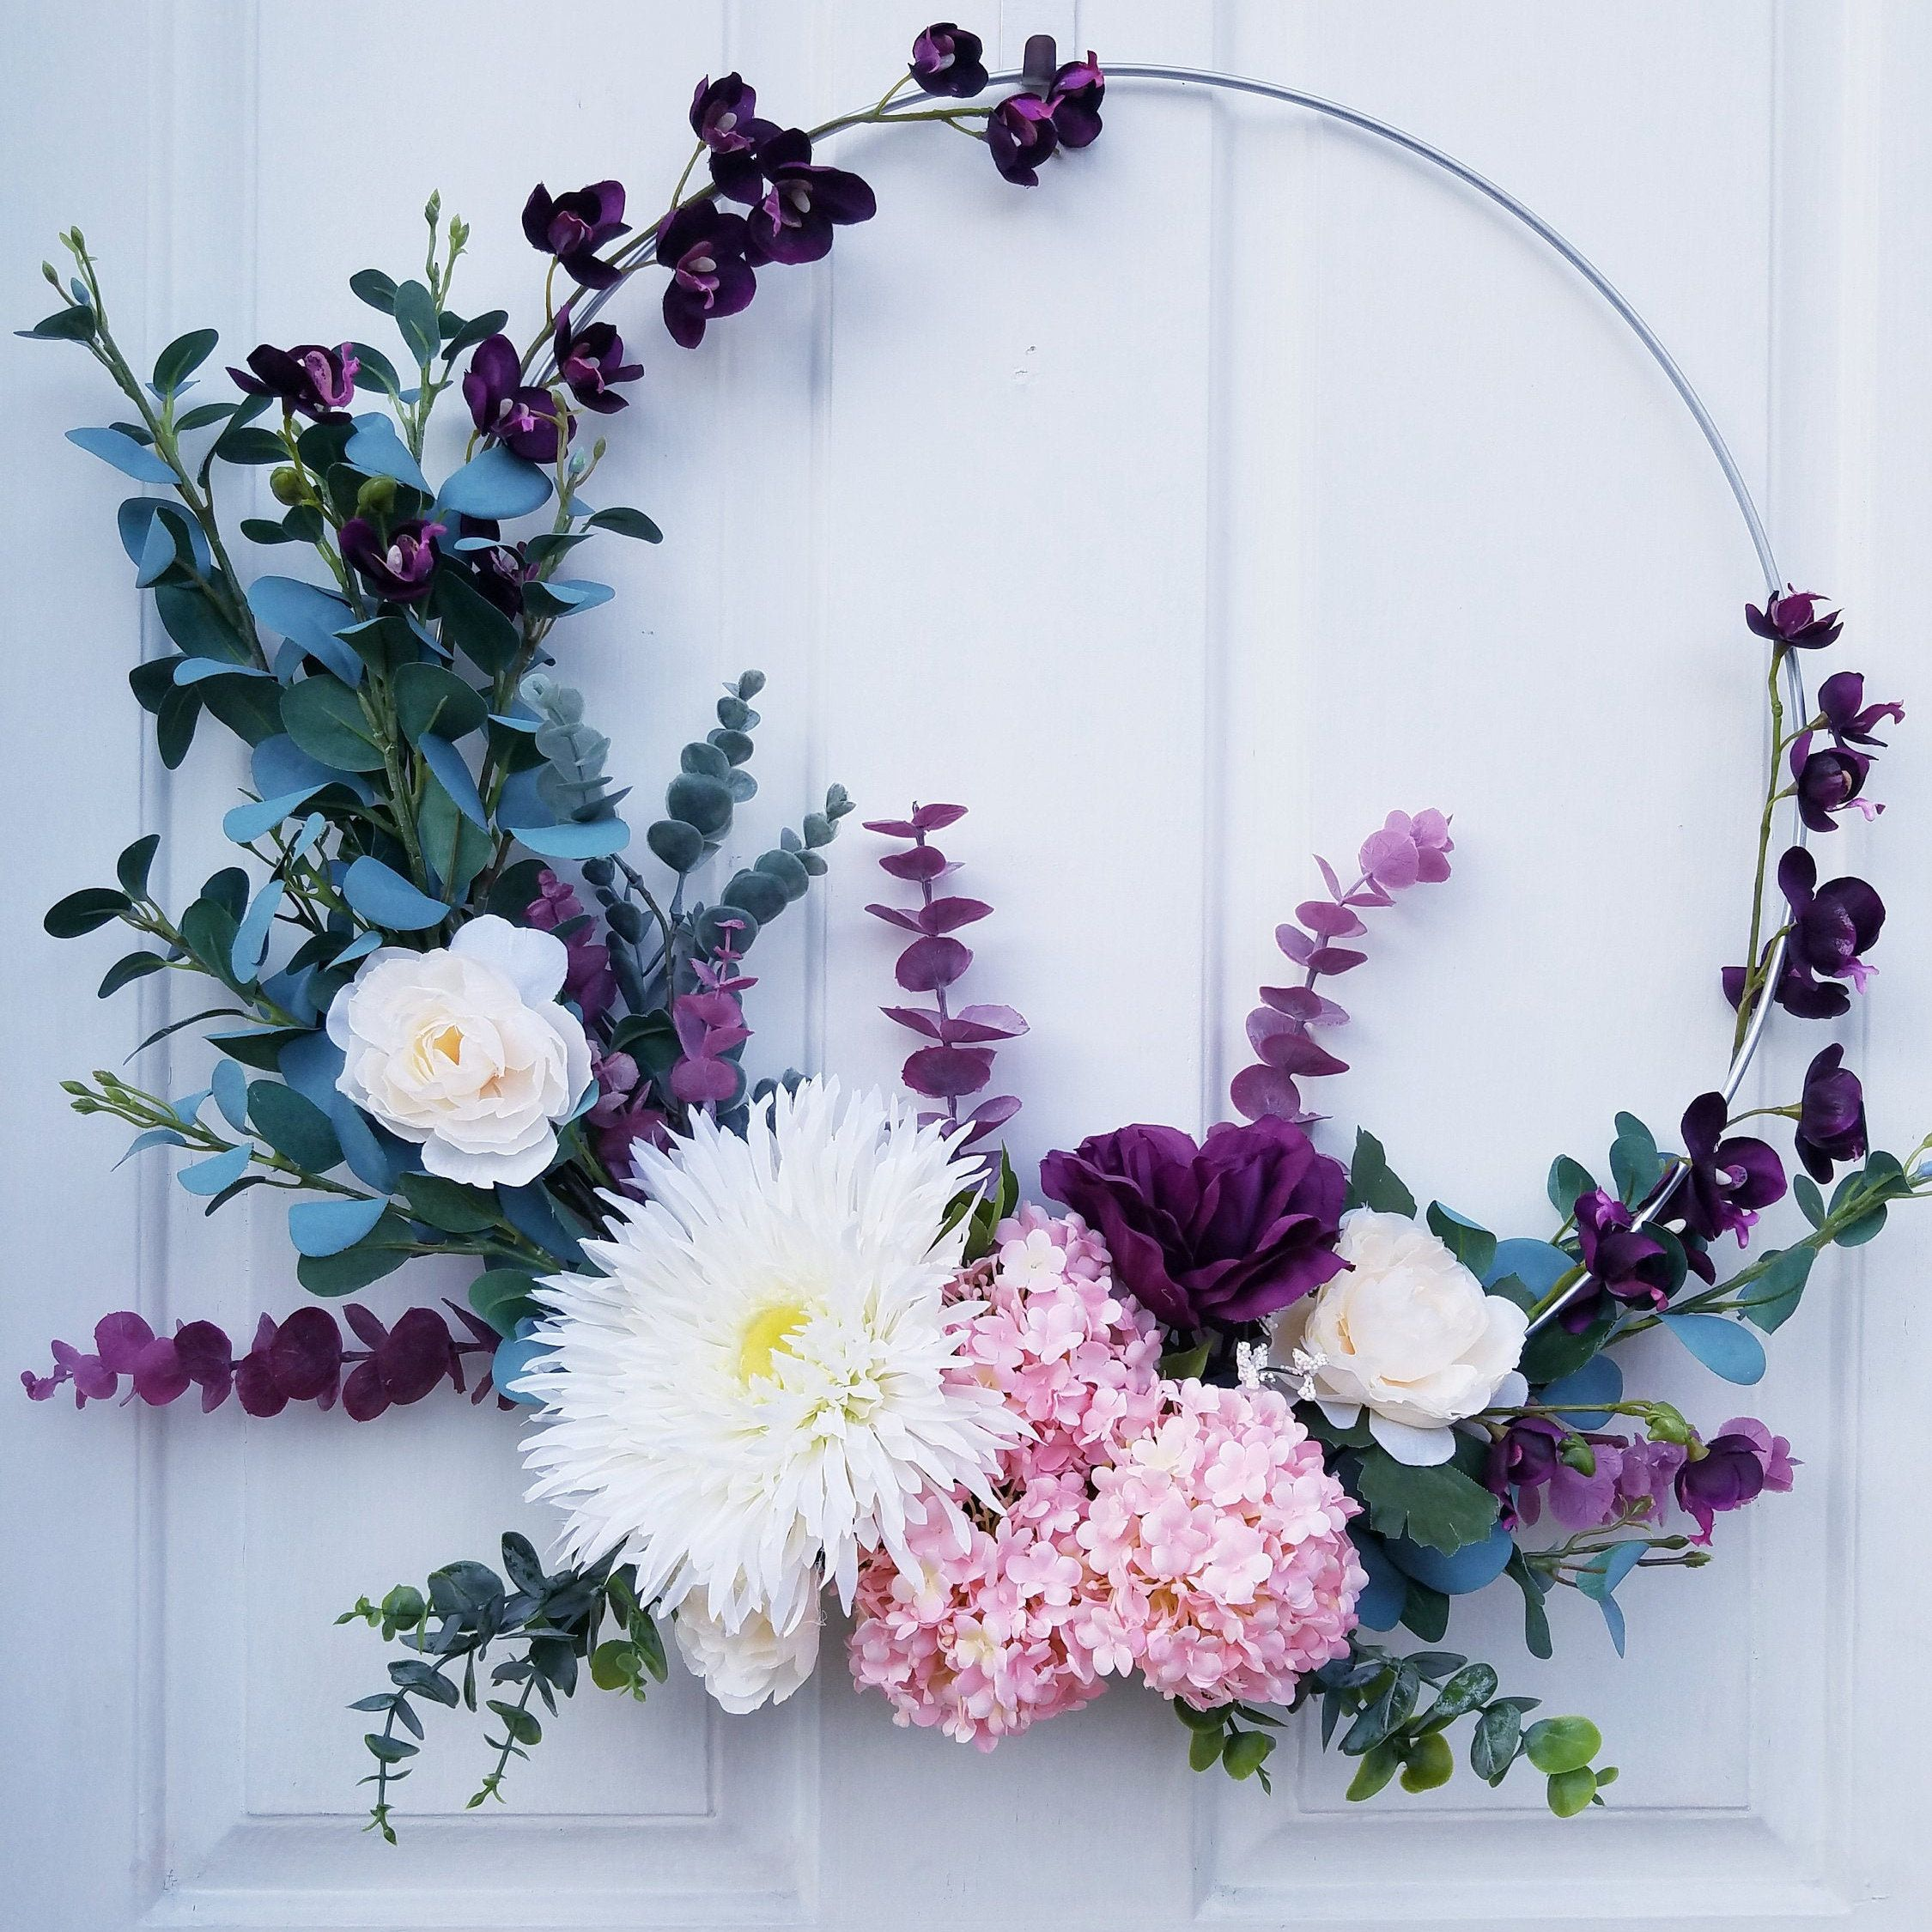 Ring Wreath Nursery Wreath |Valentine/'s Day Wreath Bridal Hoop Wreath Modern Floral Burgundy and Purple Hoop Wreath